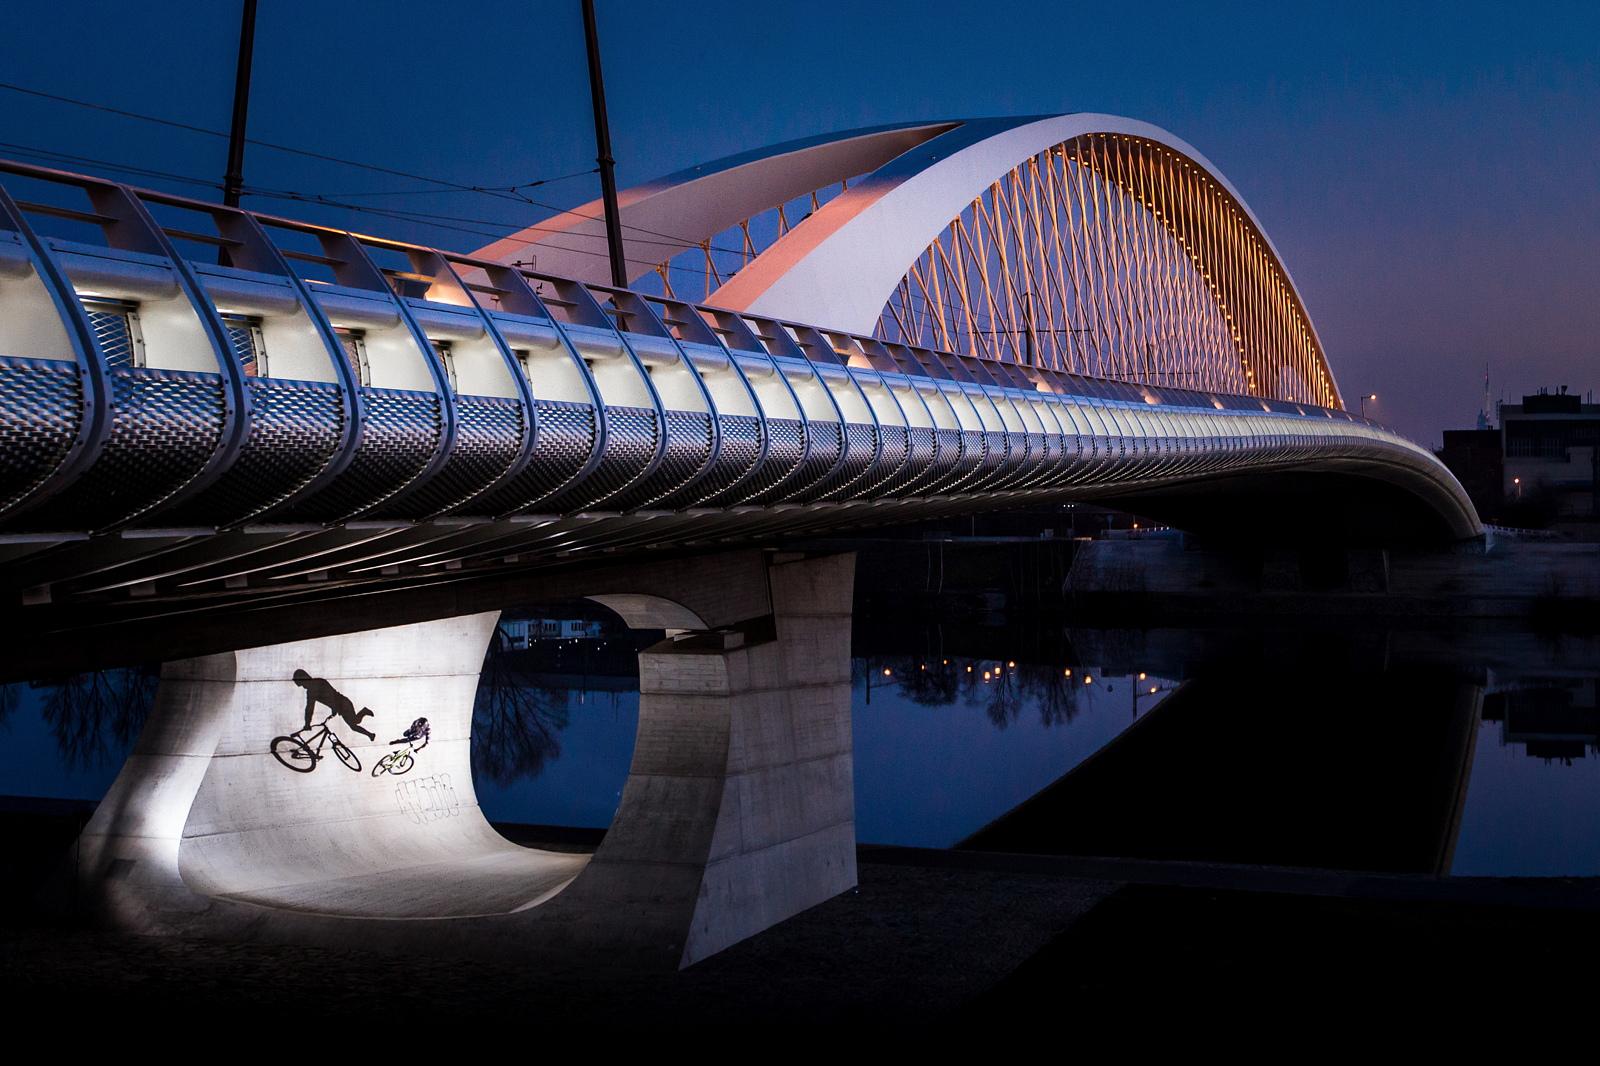 Teodor Kov tailwhiping the Troja bridge in Prague ...